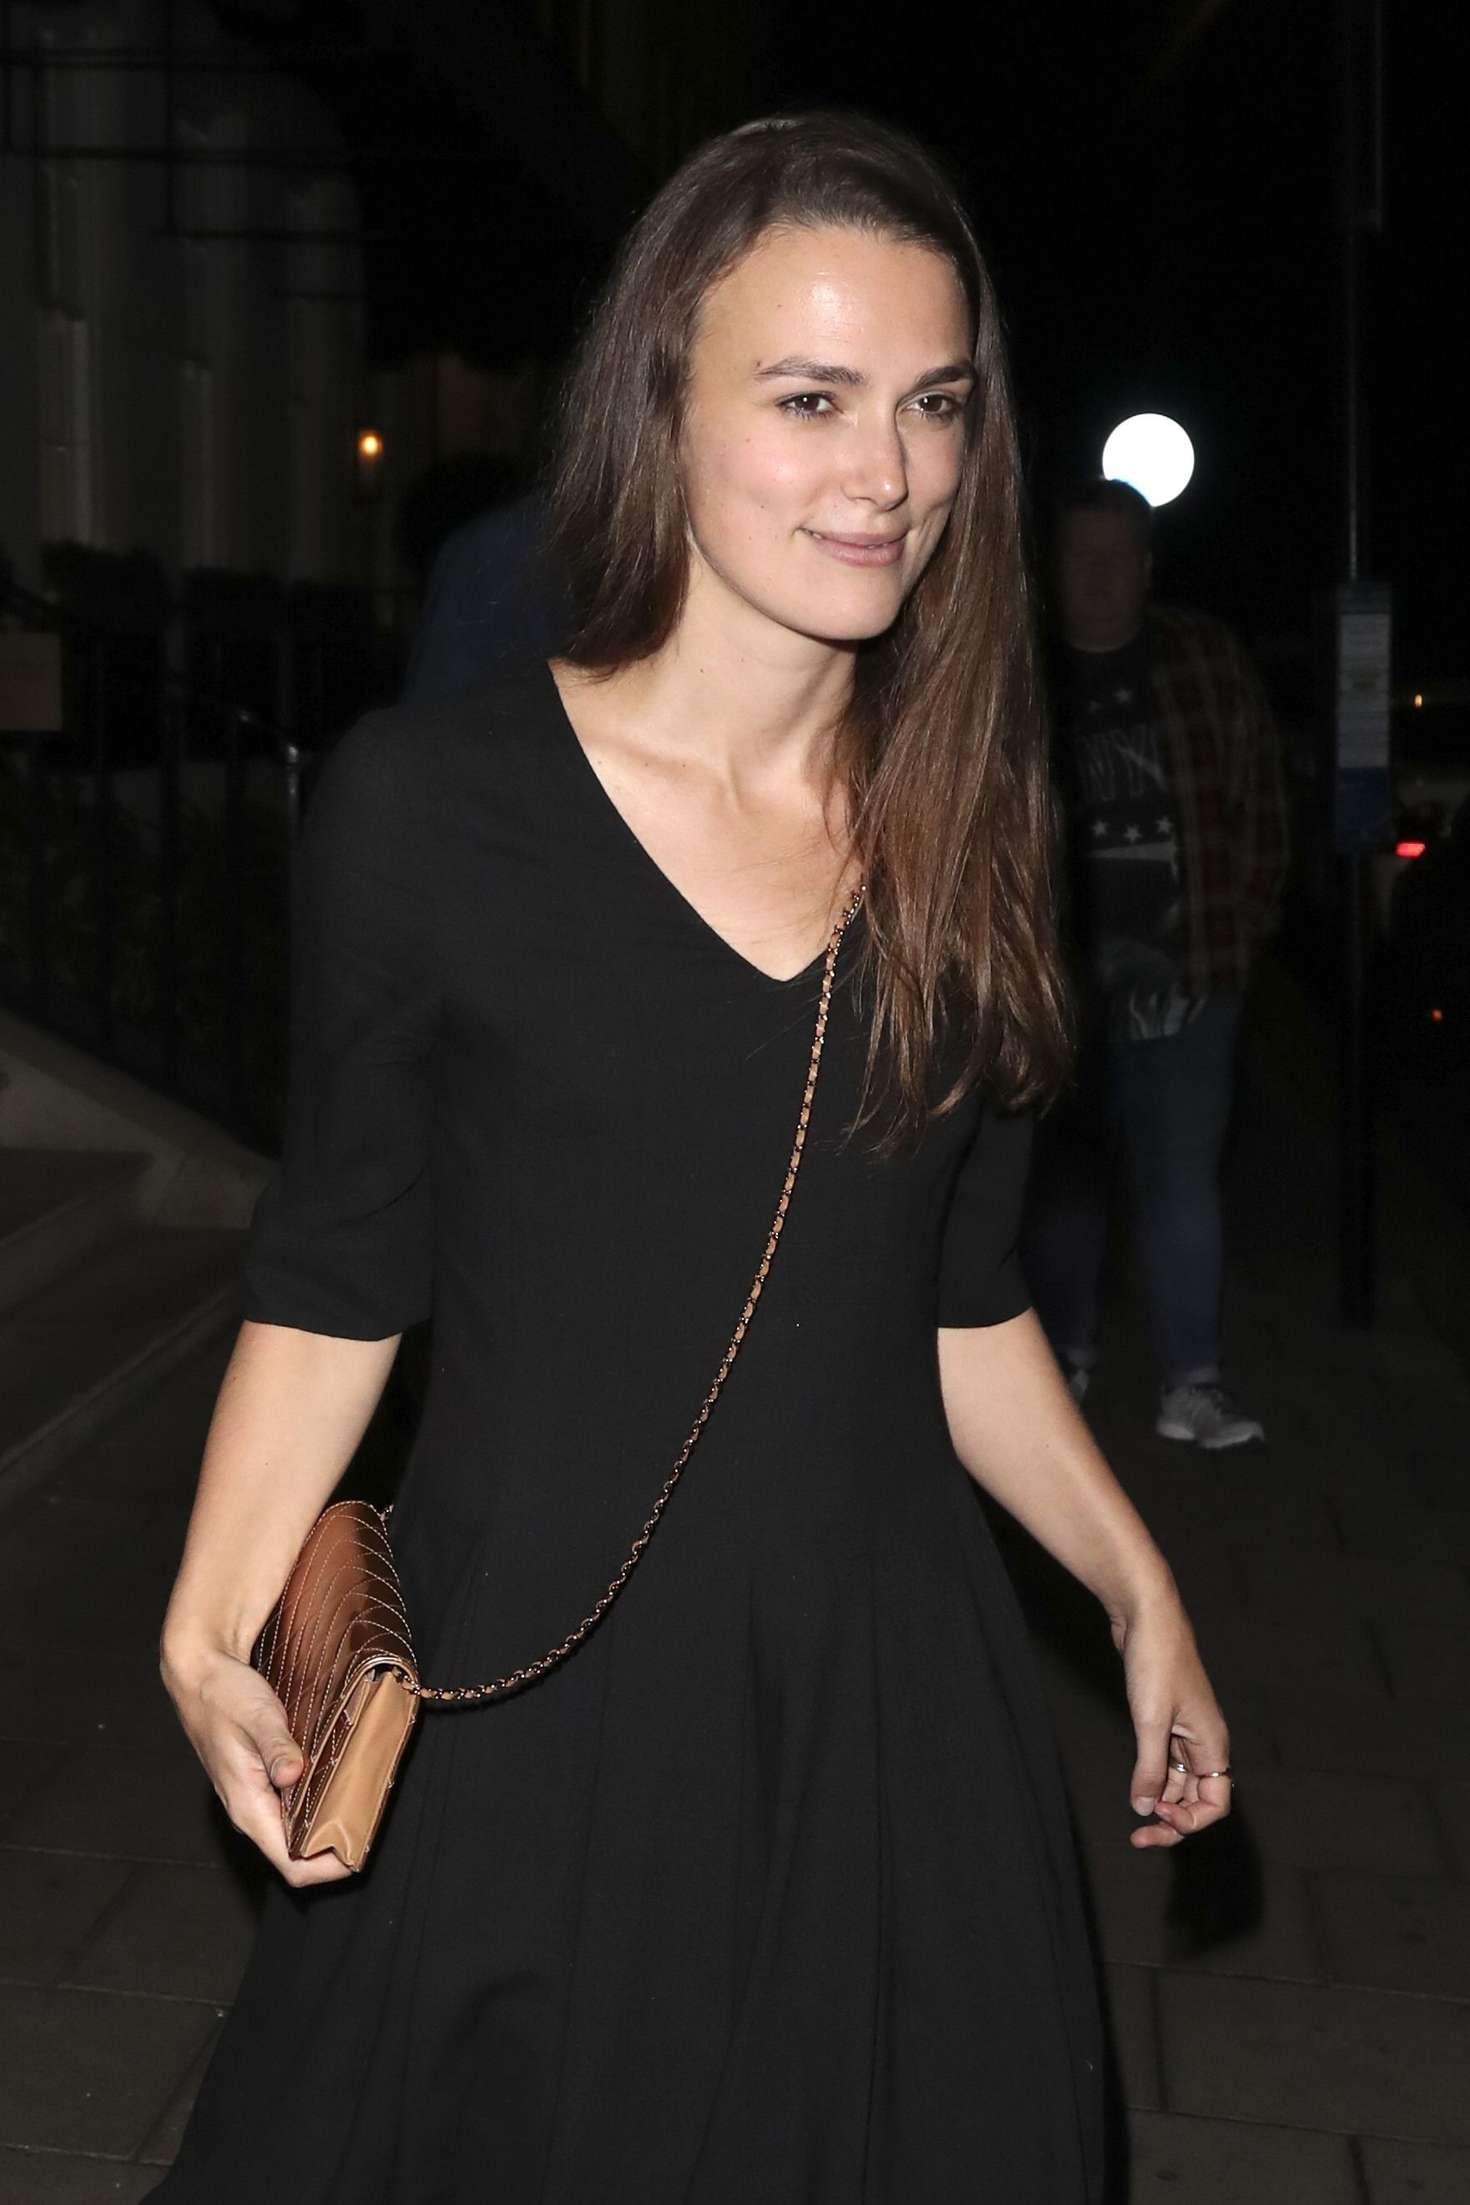 Keira Knightley in Black Dress at 34 Restaurant in London